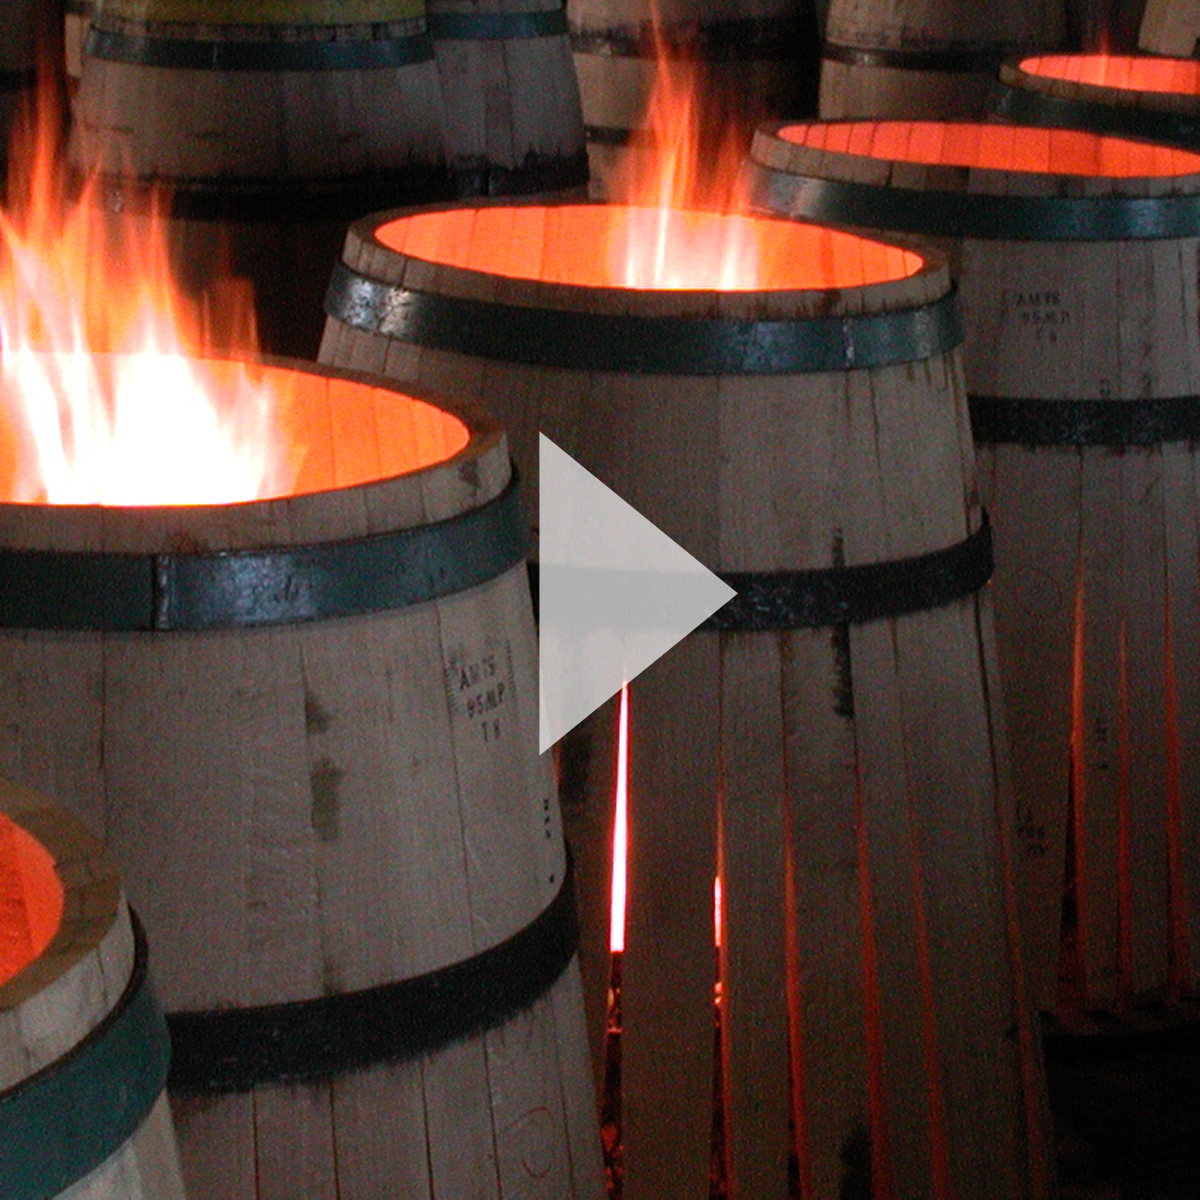 barrels-video-icon.jpg